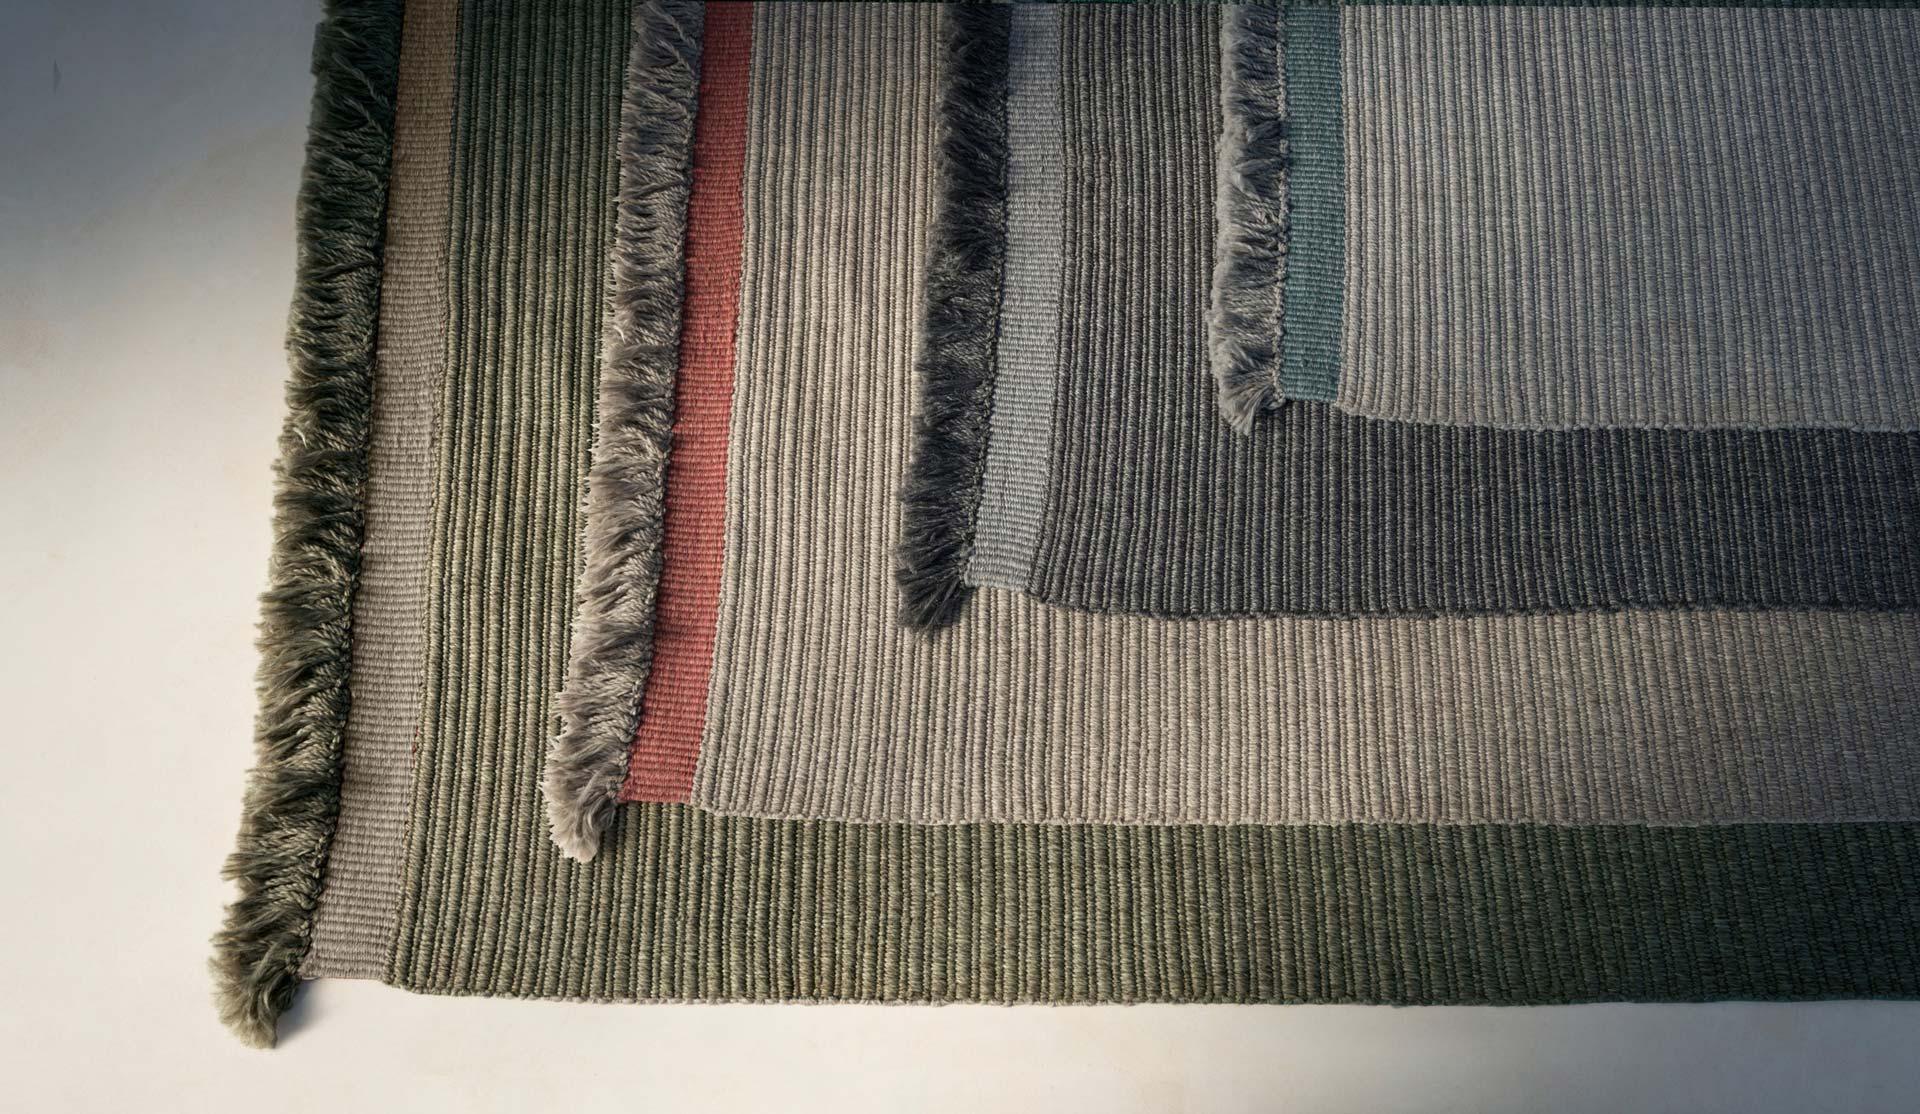 Accessories Fabric Carpet//Ribs